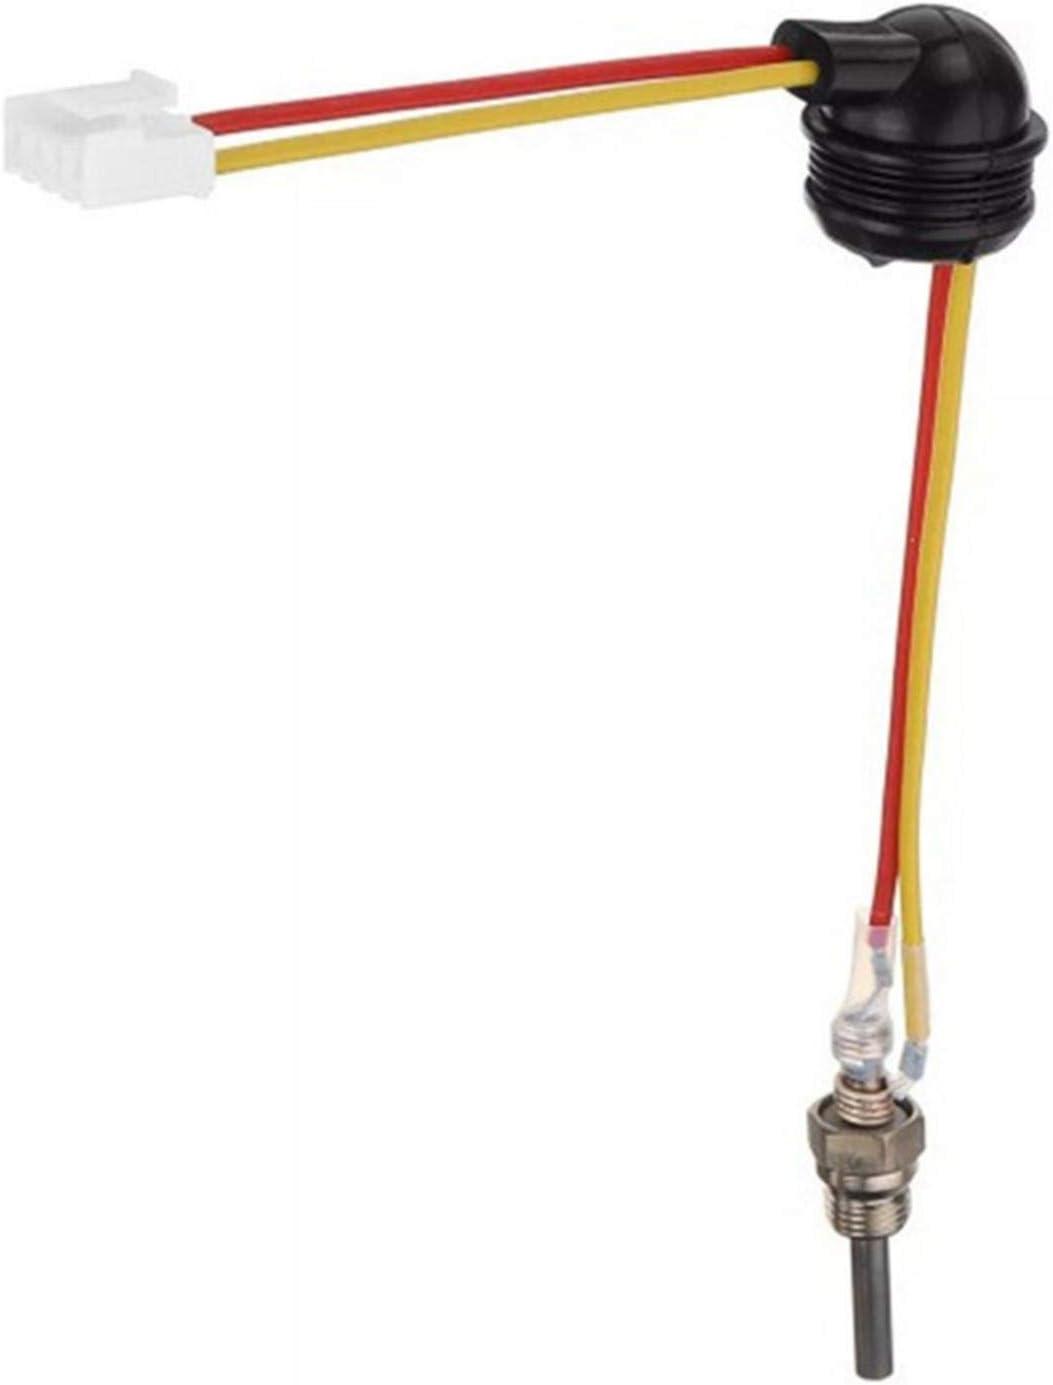 Plug for Diesel Heater,12v//24v Parking Heater Ignition Plug Fittings Car Truck Parking 88-98w Universal Air Diesel Heater Glow Plug for Universal Parking Heater